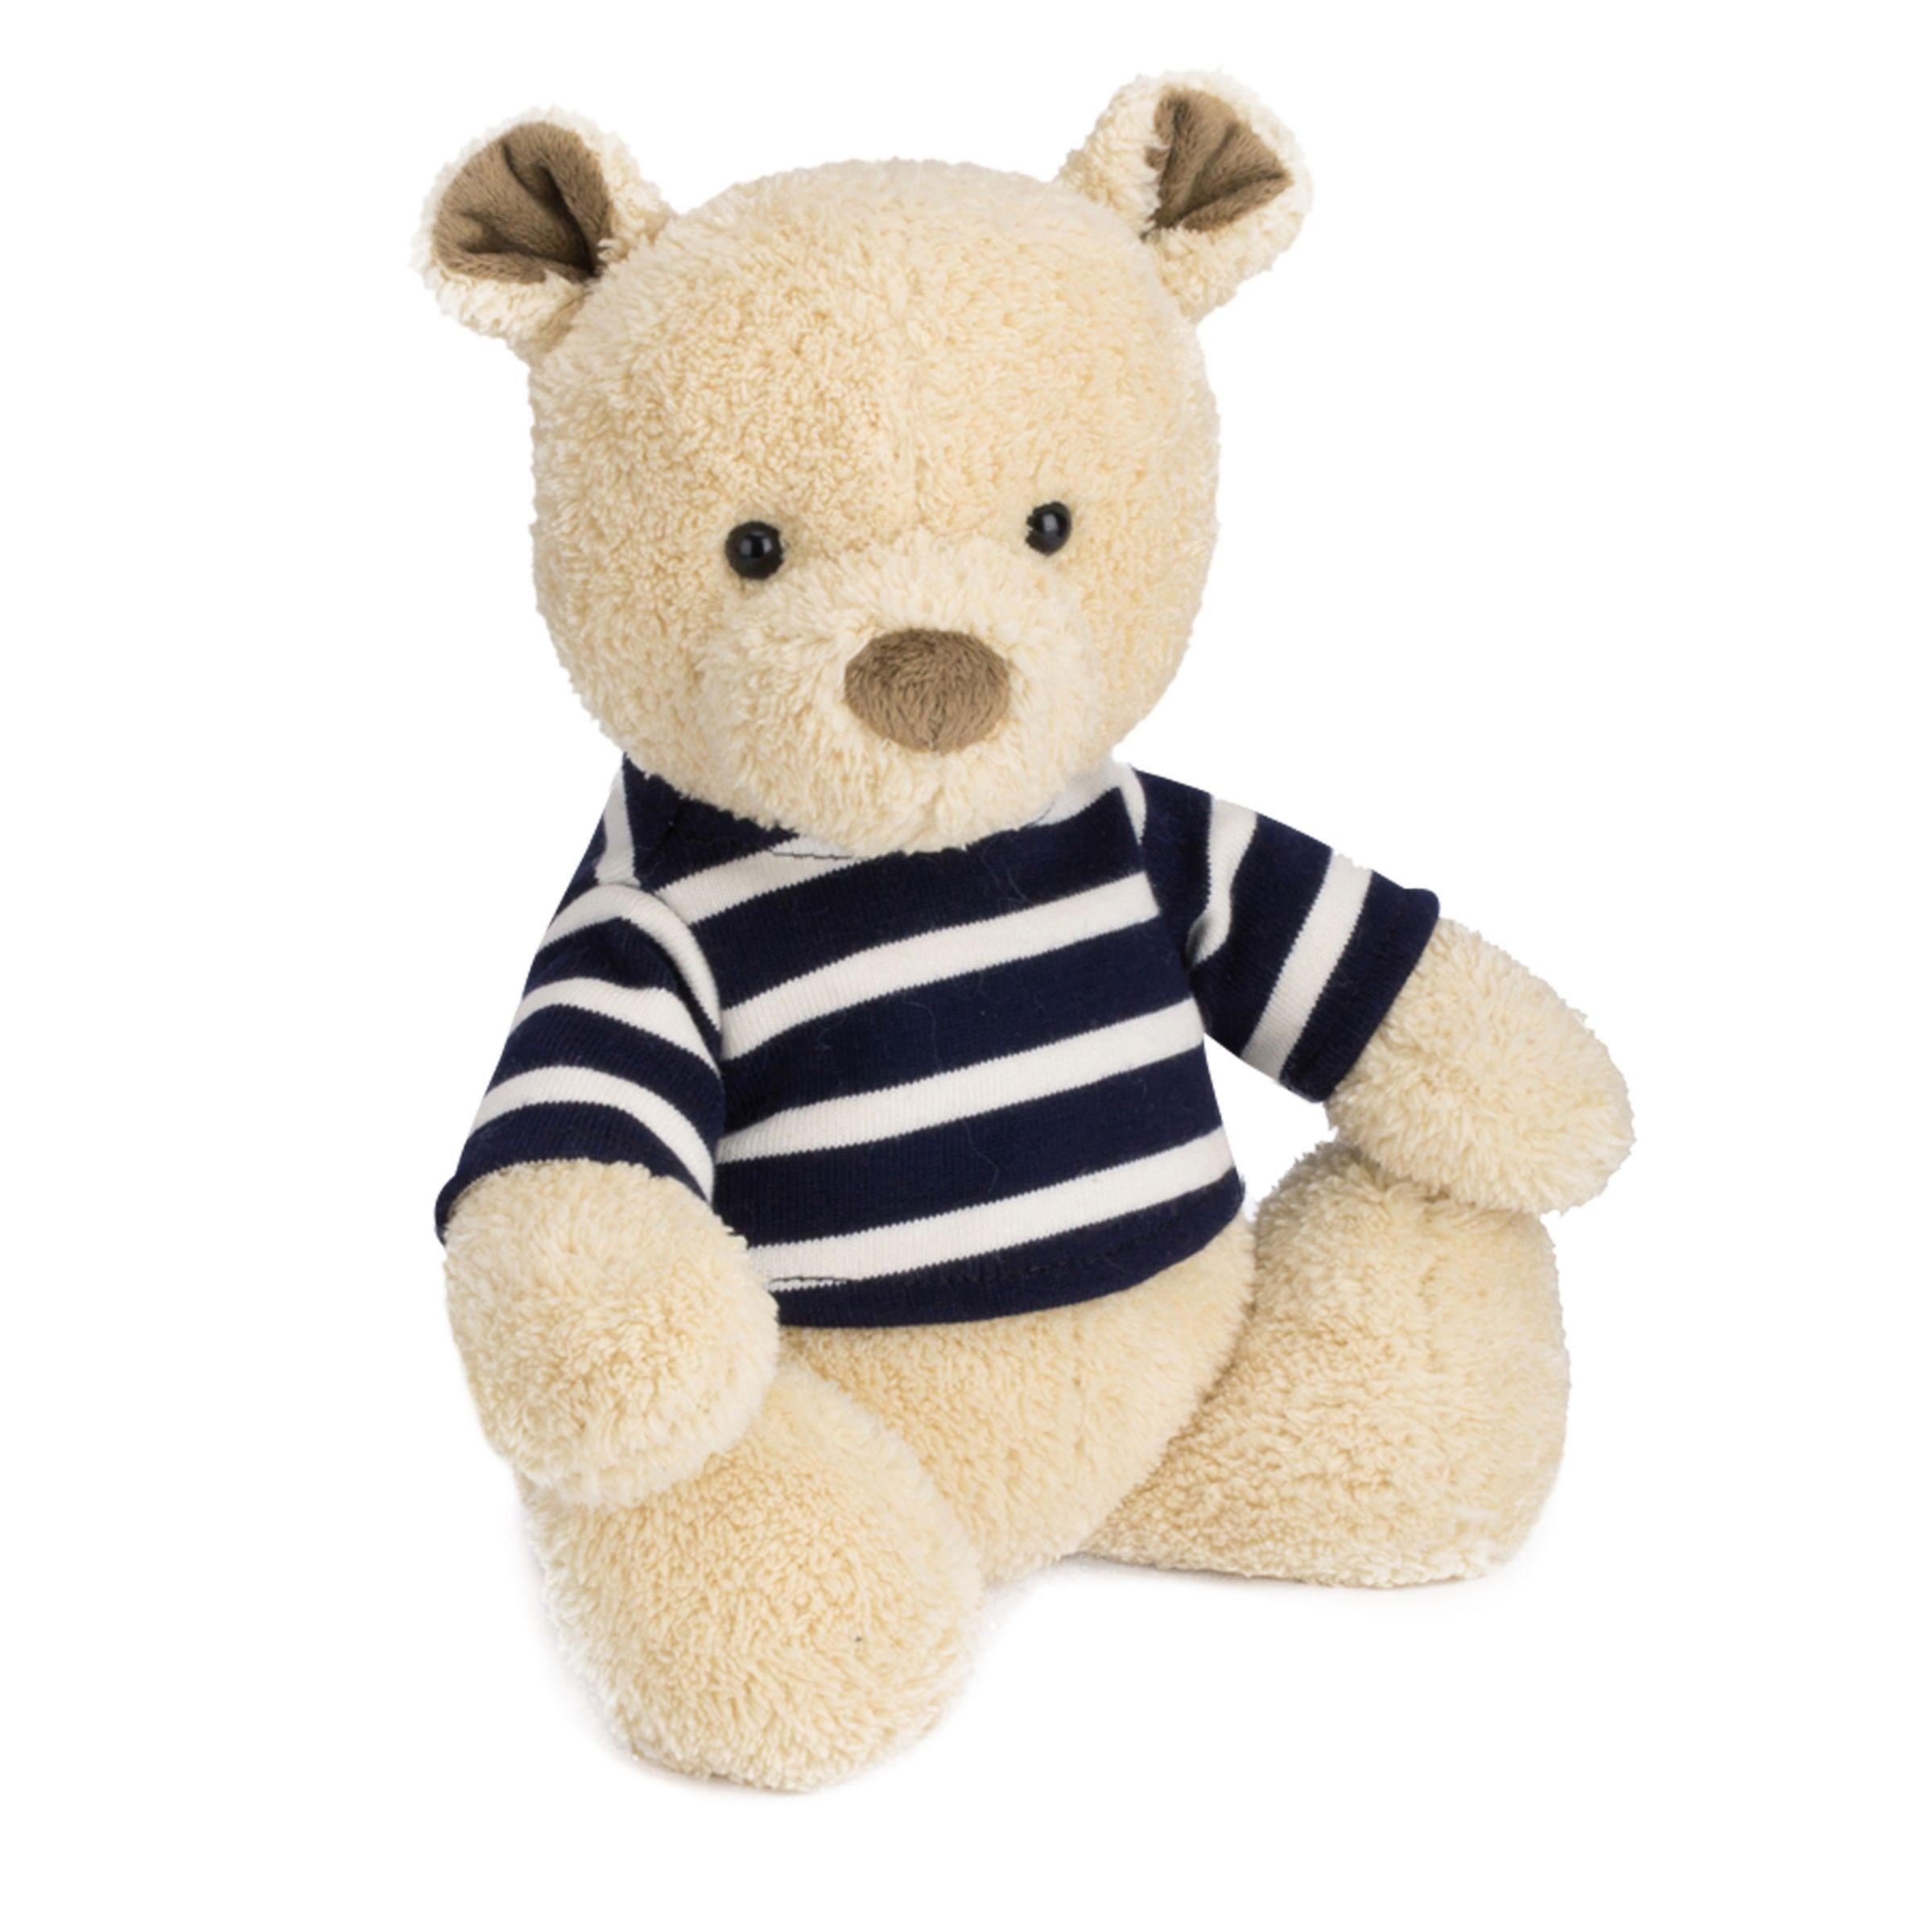 Jellycat Jellycat Breton Teddy Bear Soft Toy